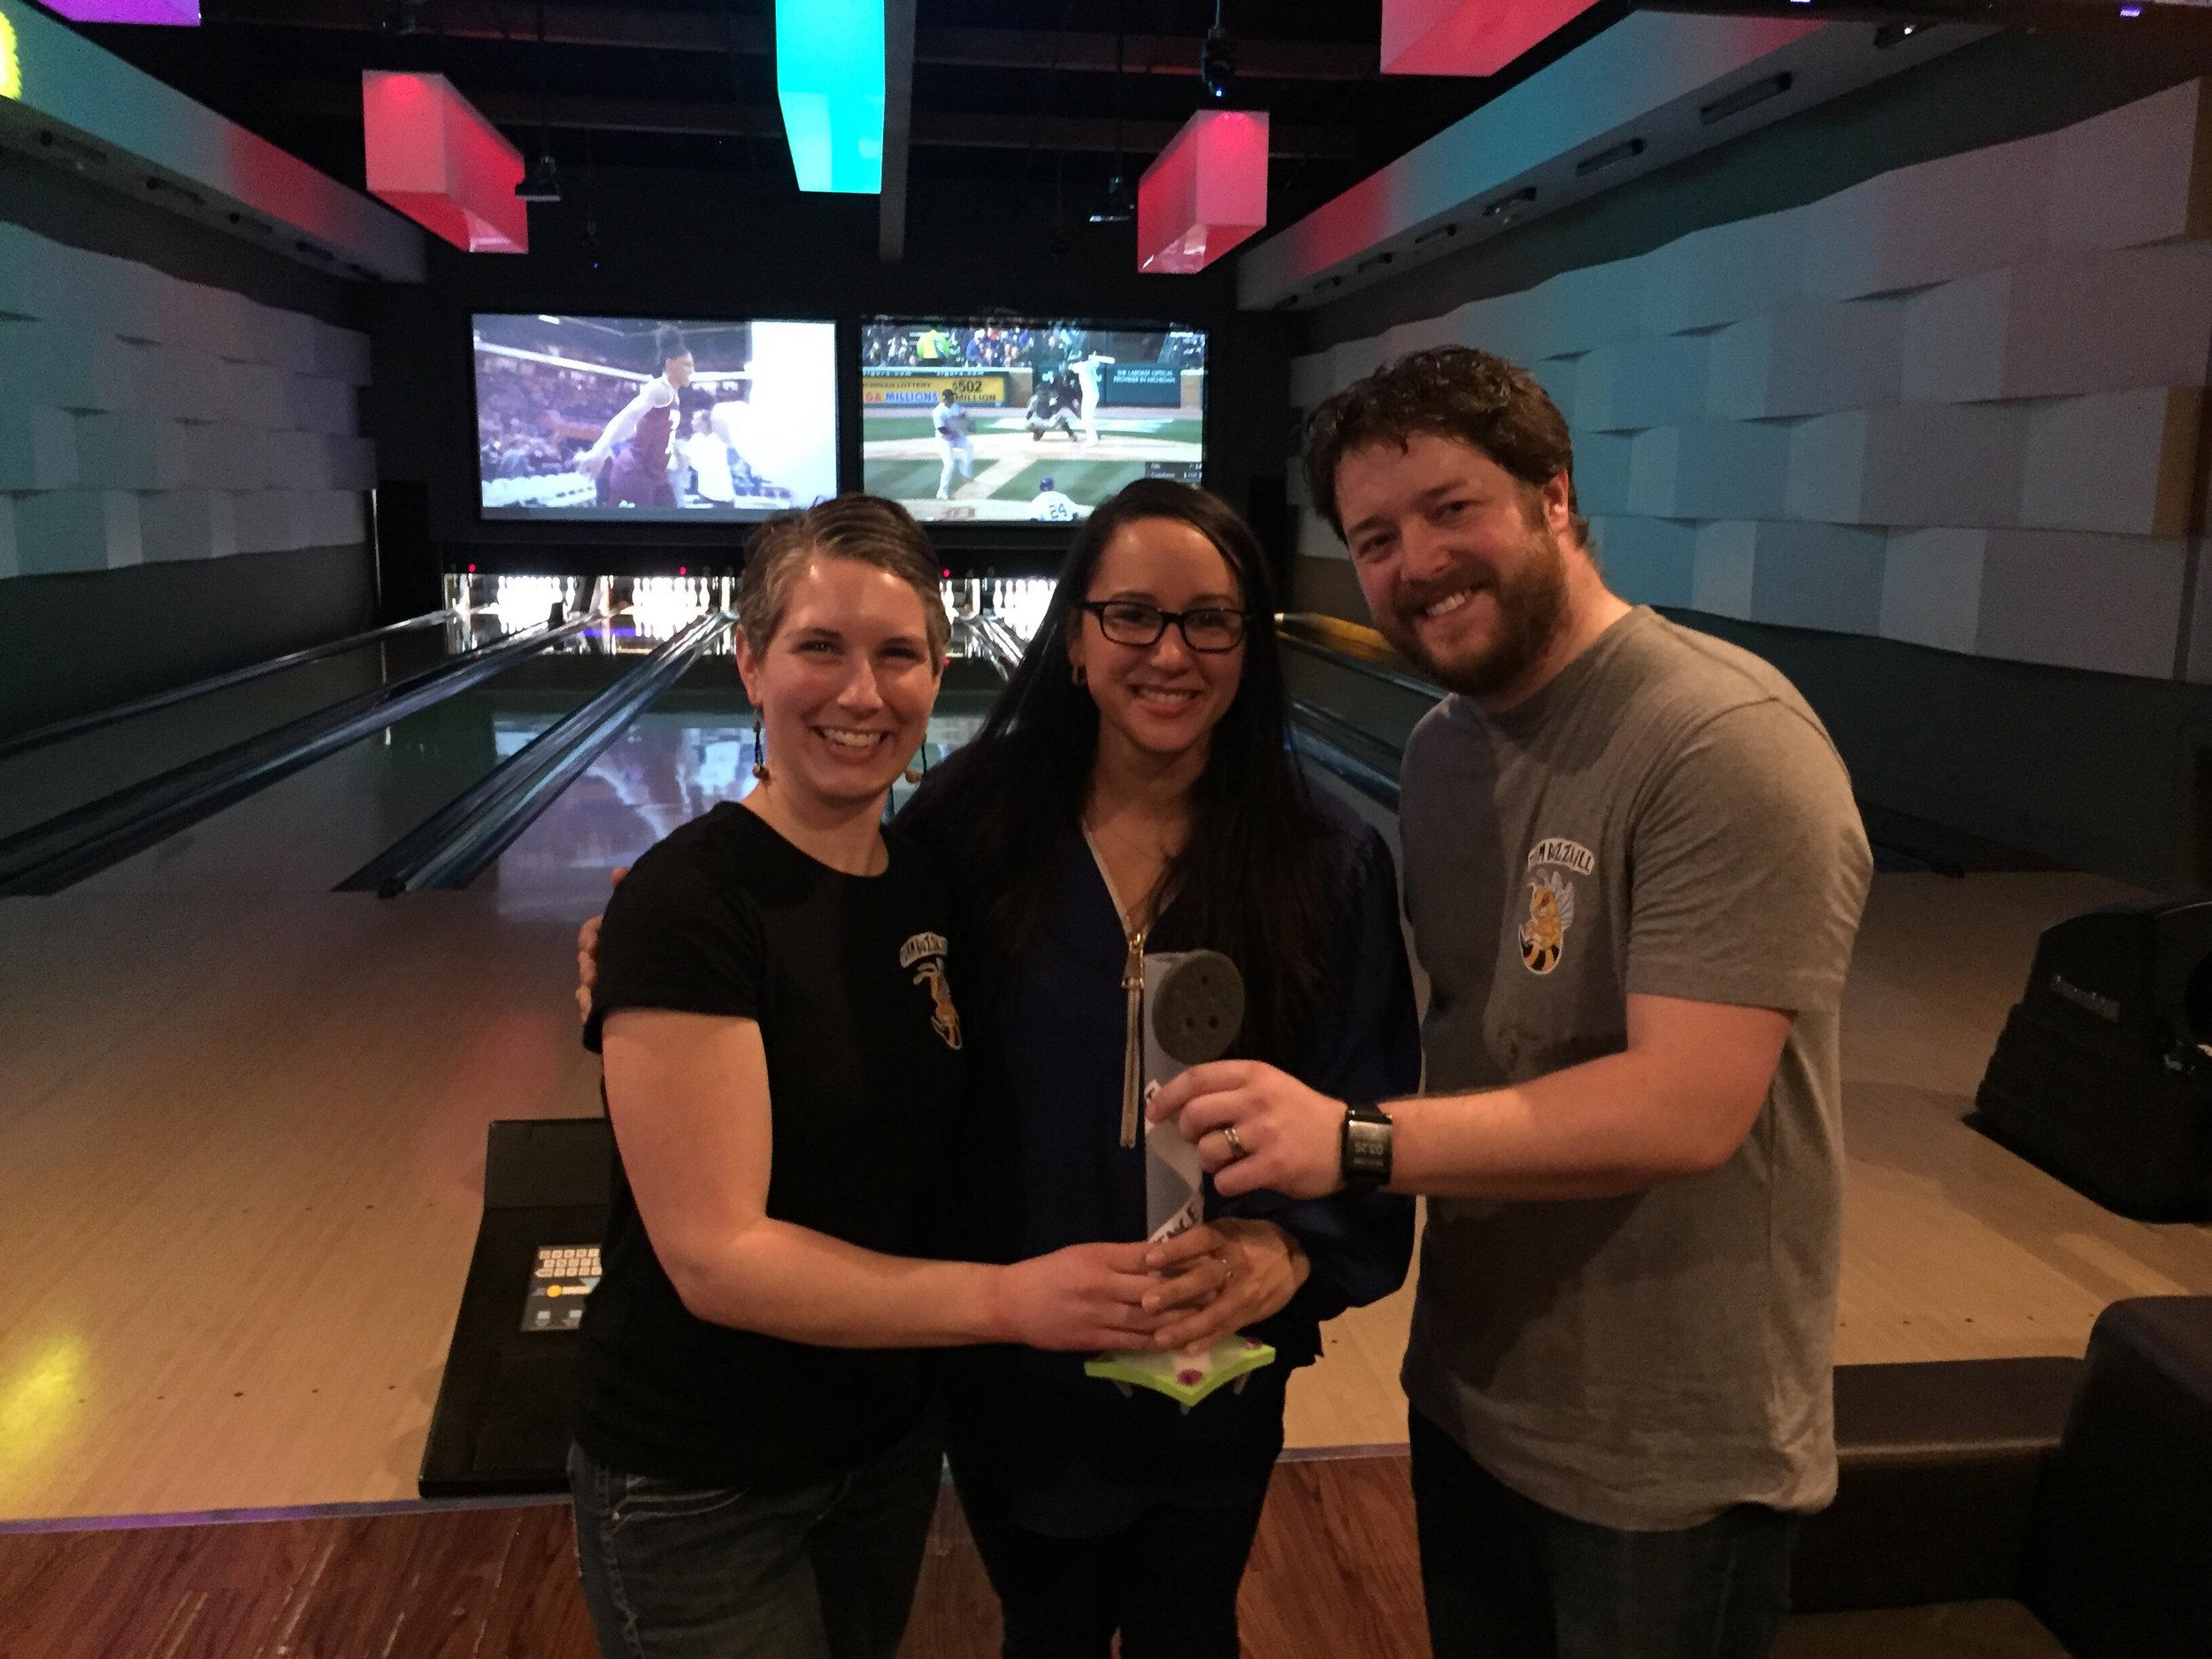 bowling touney champs!